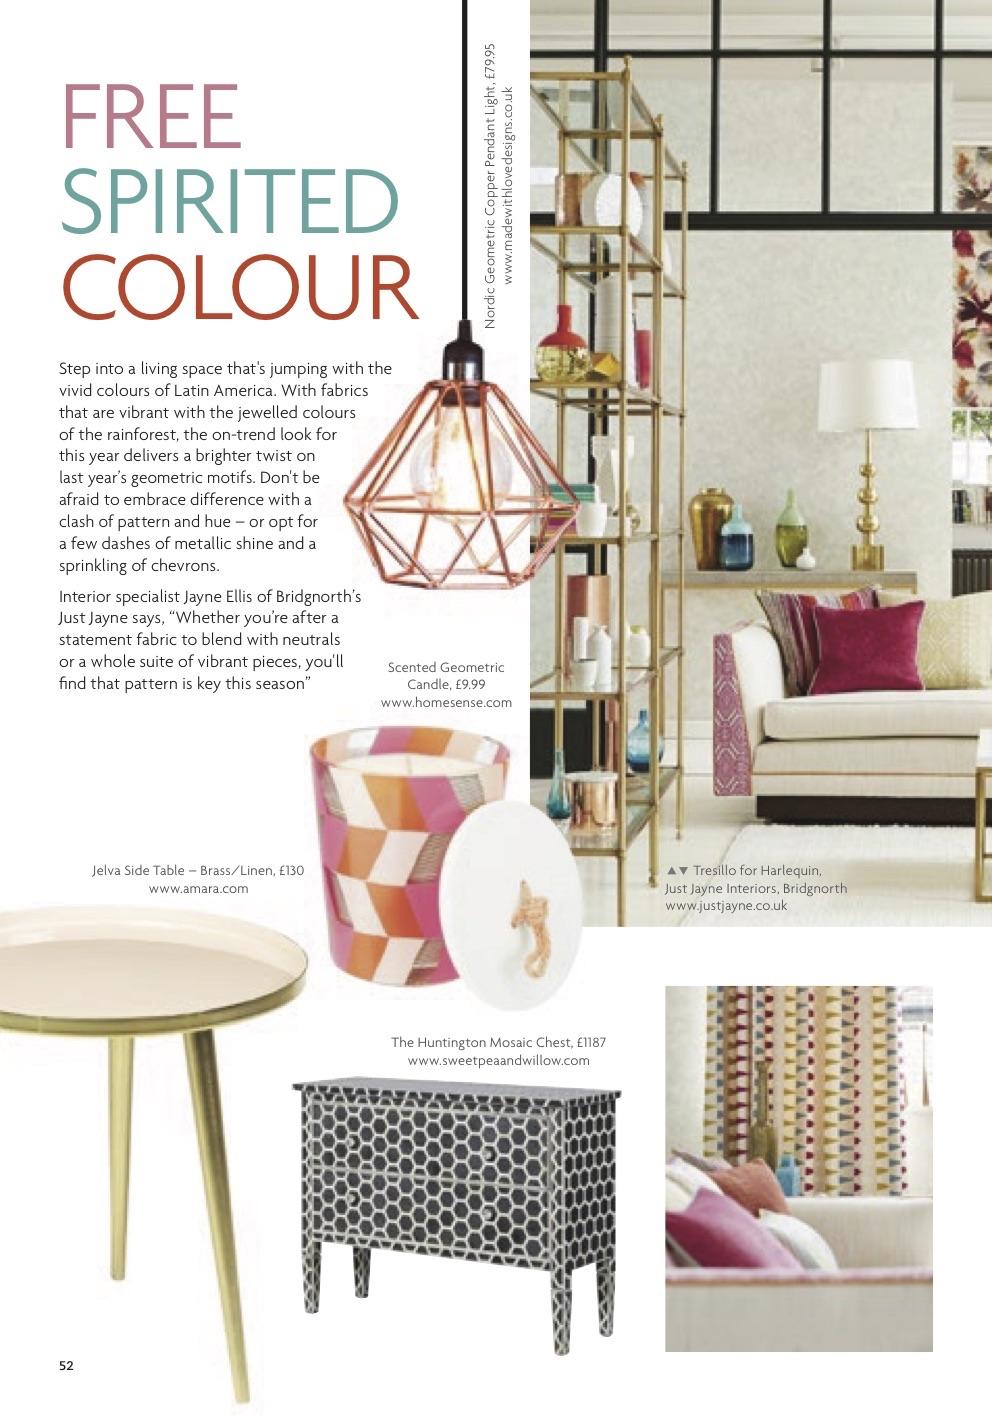 fashion and lifestyle - free spirited colour